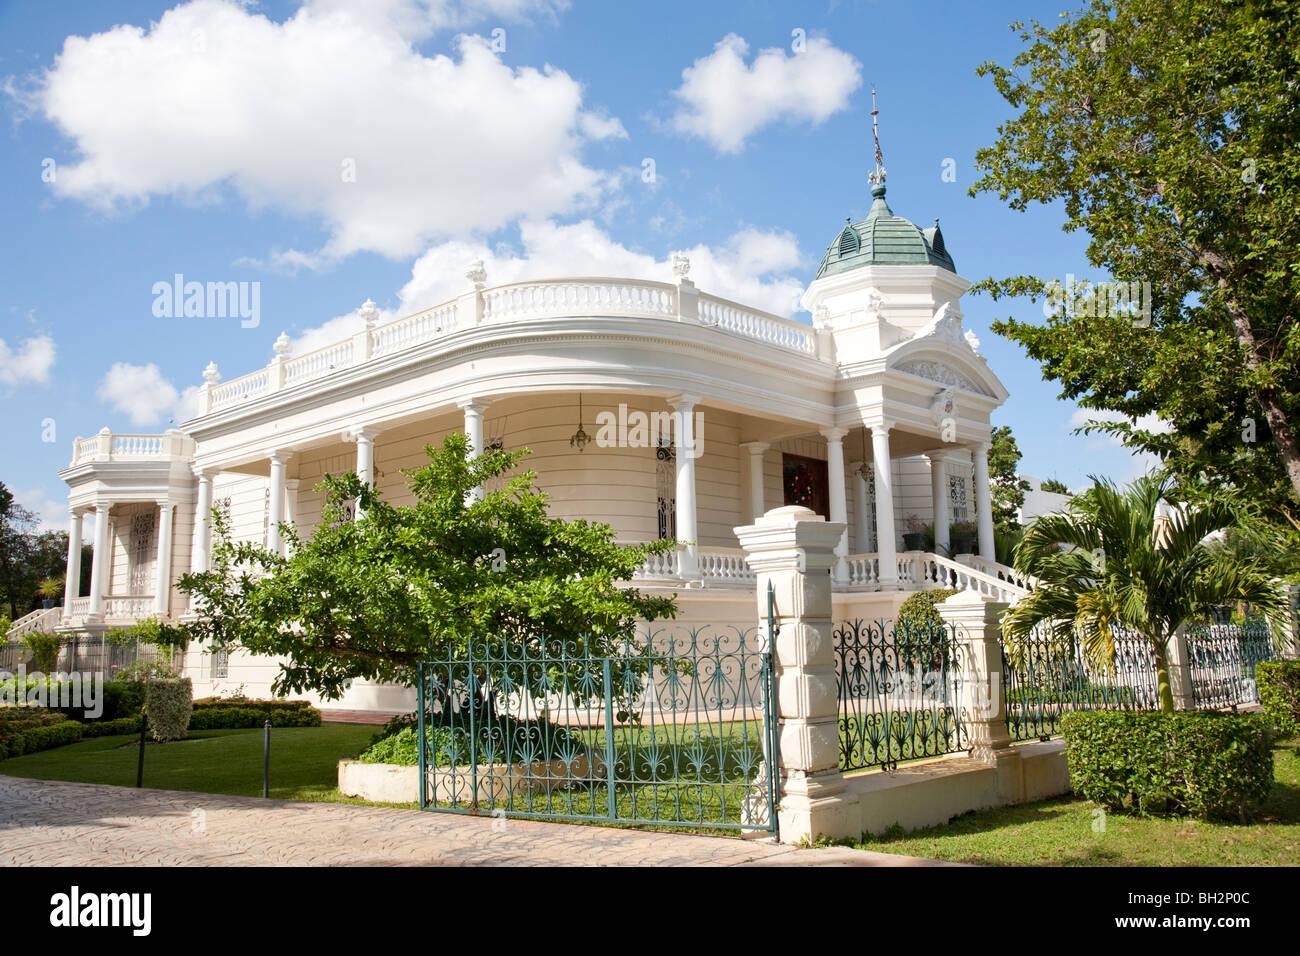 Casa Museo Quinta Montes Molina, Merida, Yucatan, Mexico. - Stock Image